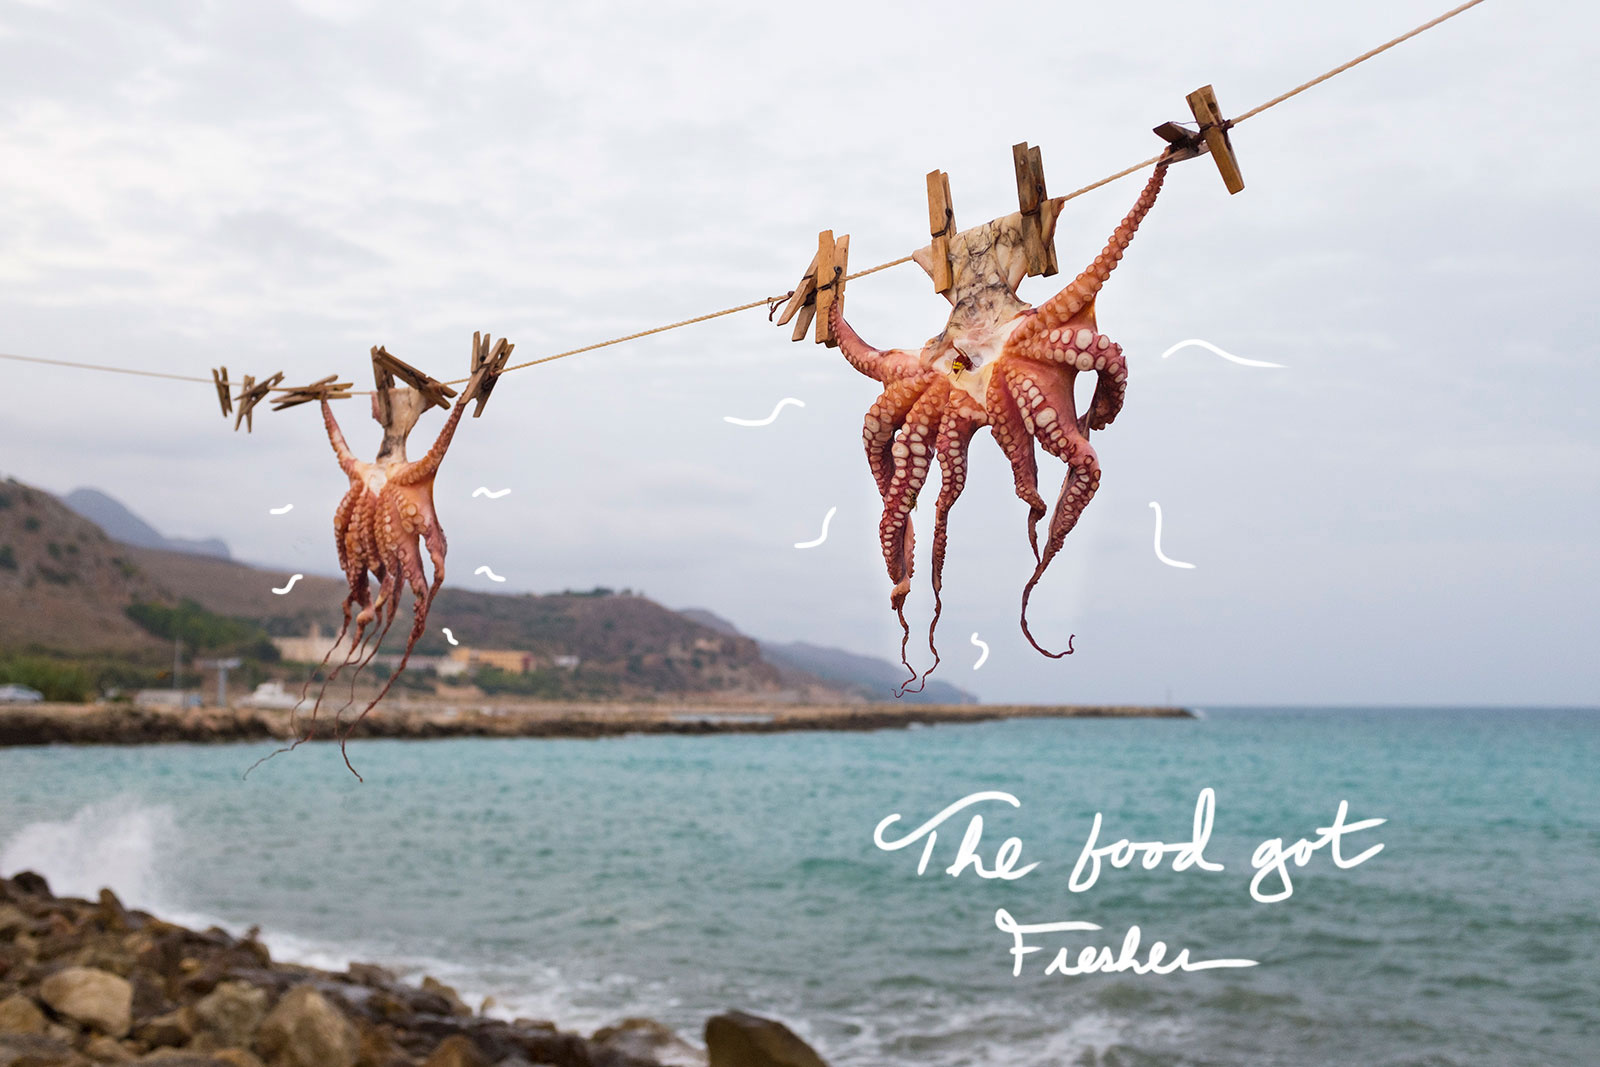 octopus-Blend-travel_photo_39